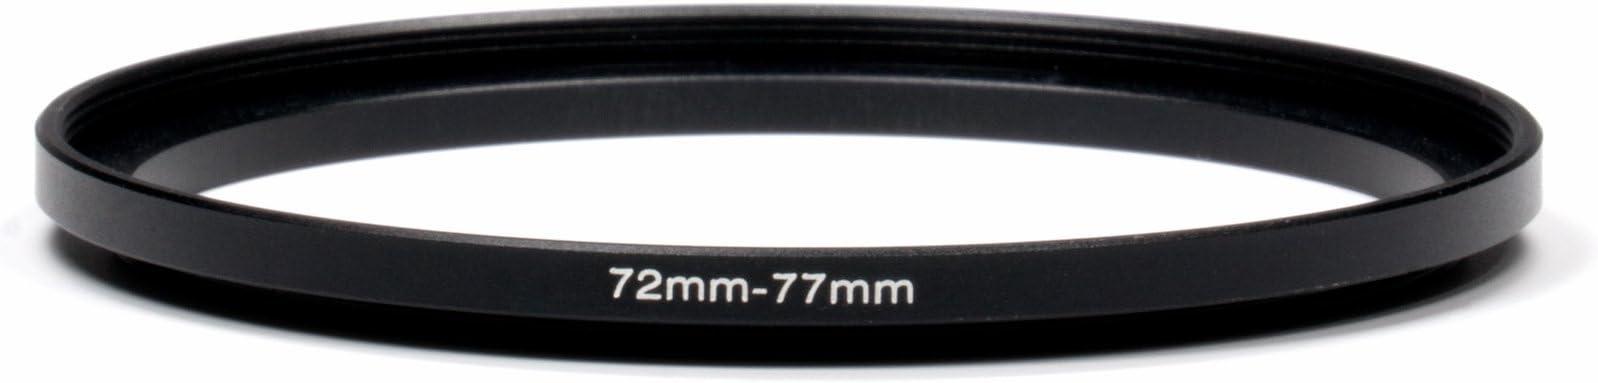 Belmalia 67mm UV CPL Filtro Set para Objetivos p.ej FLD DSLR Canon Olympus Nikon Sony Pentax y m/ás